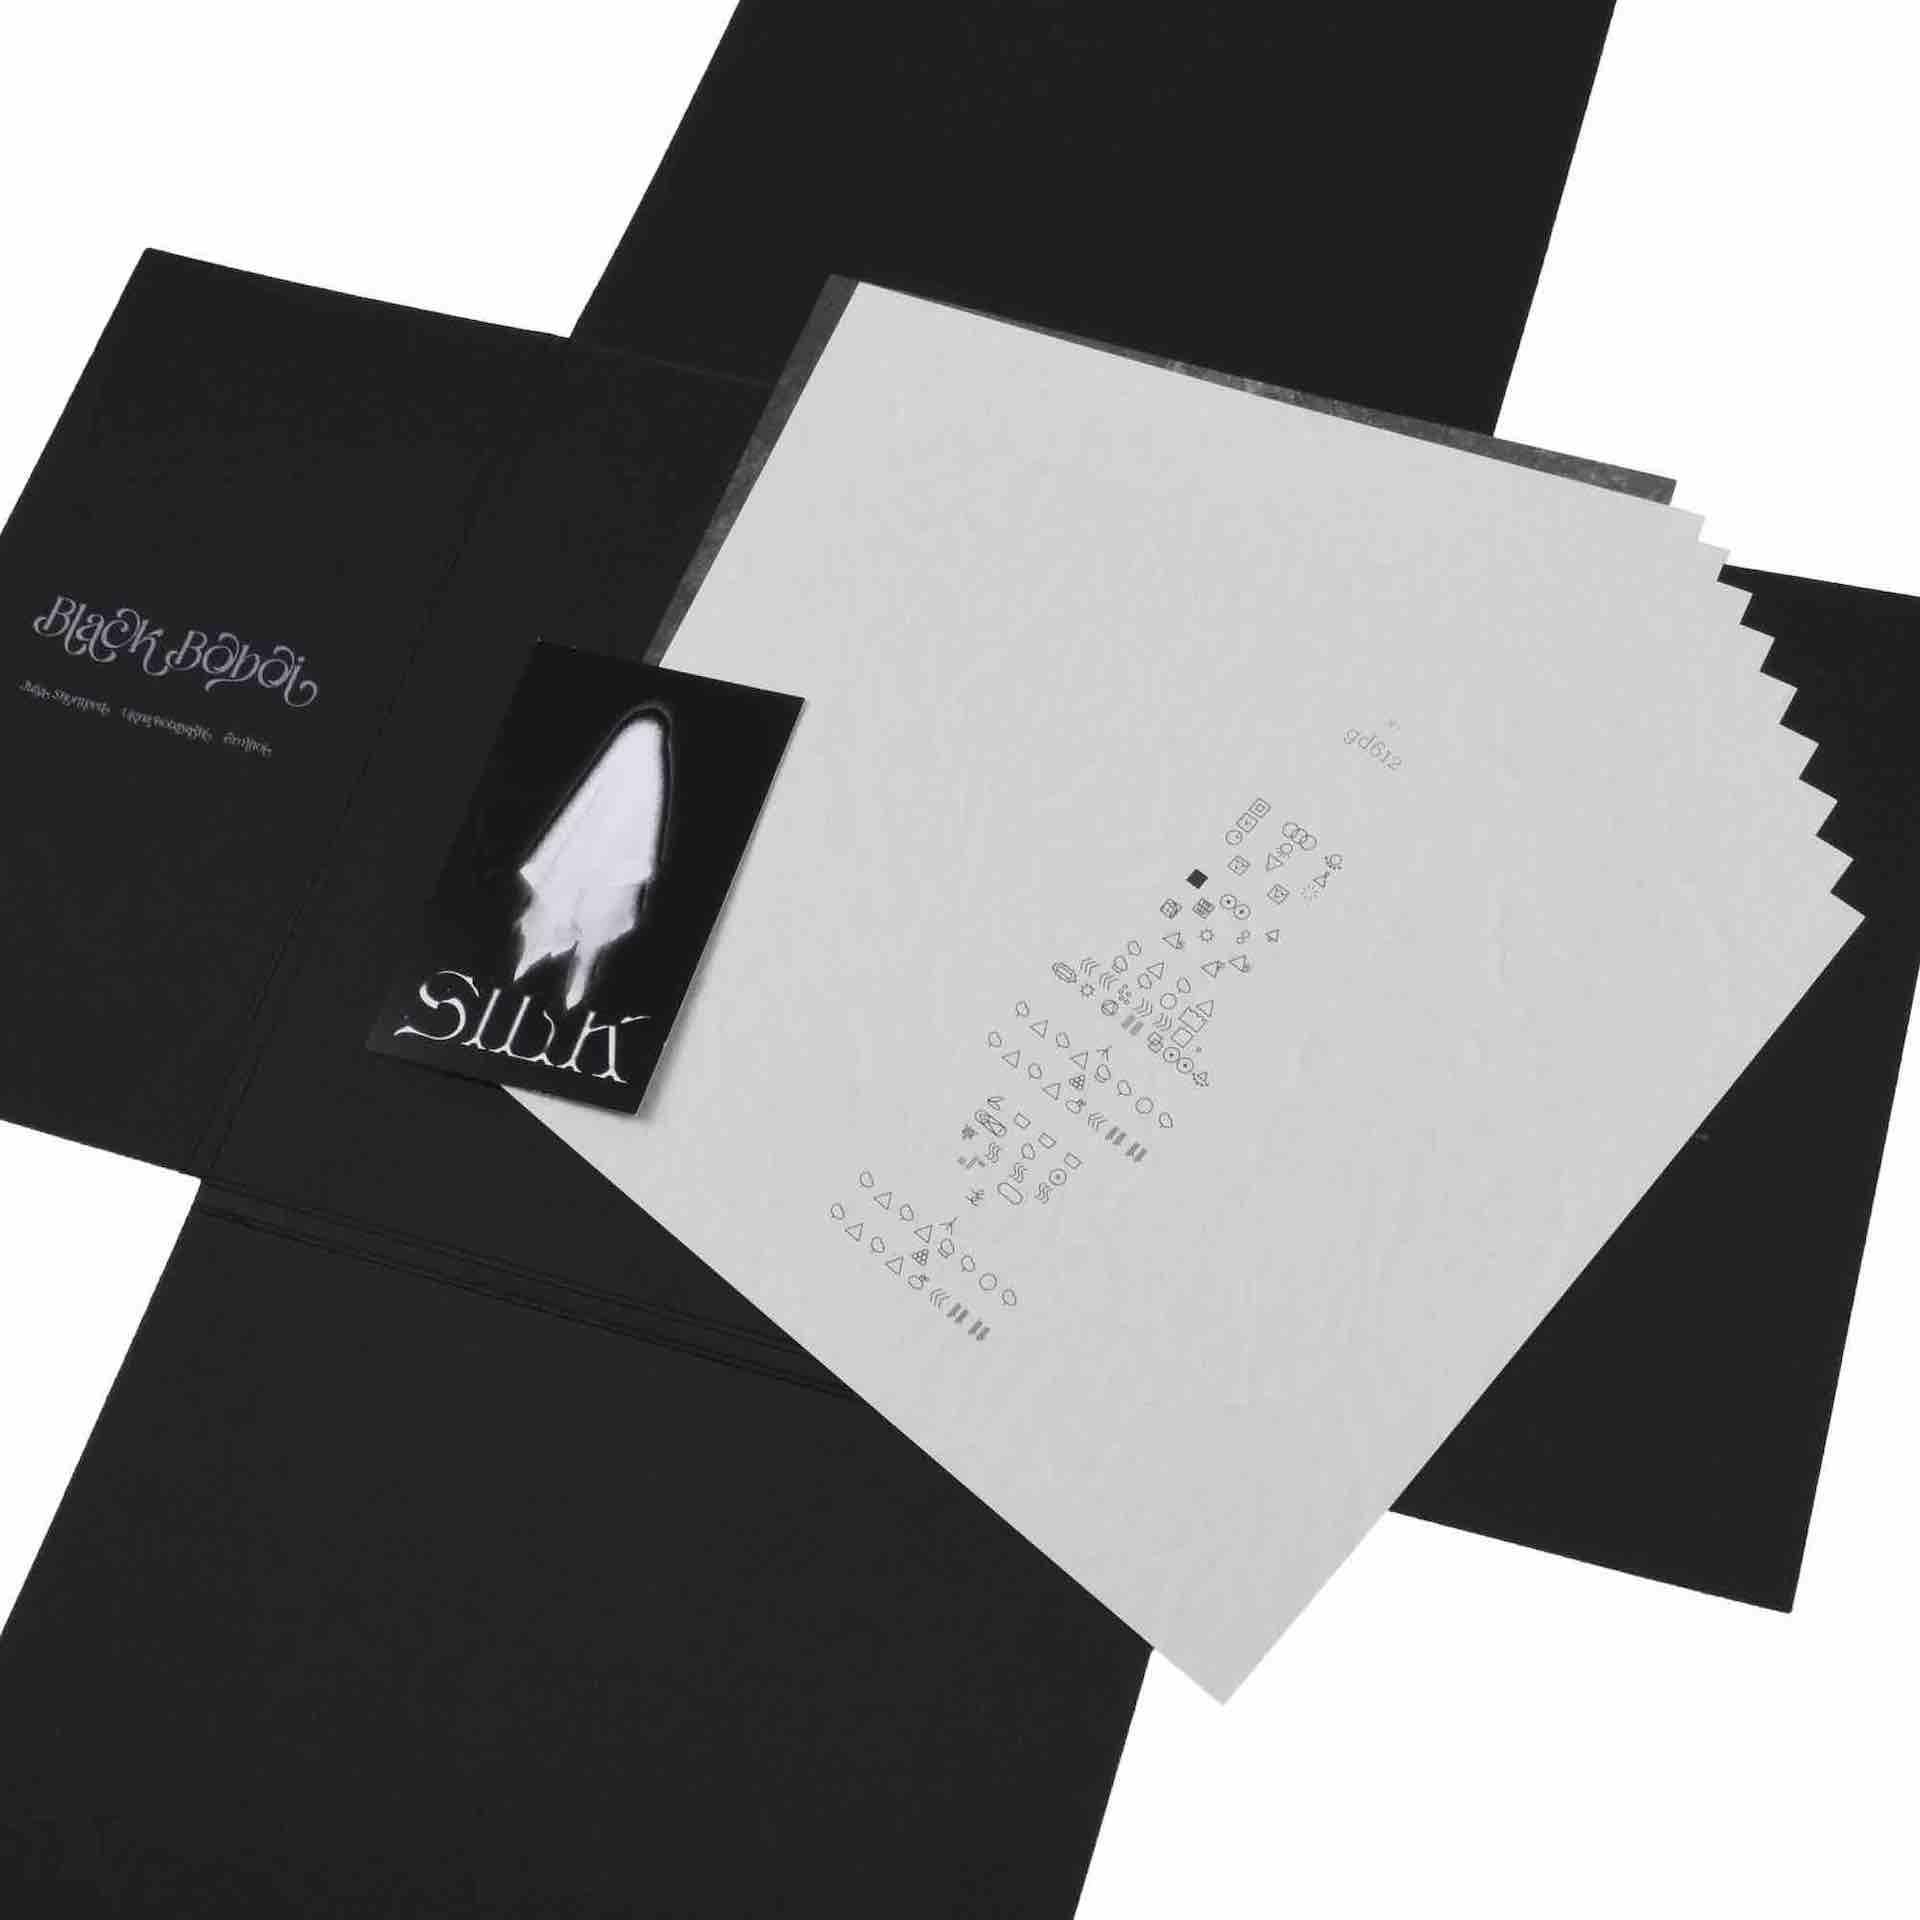 Black Boboi最新アルバム『SILK』のDLコード付きリリックブックが発売!公式ロンT、フーディー、スカーフも受注受付スタート music201214_blackboboi_8-1920x1920